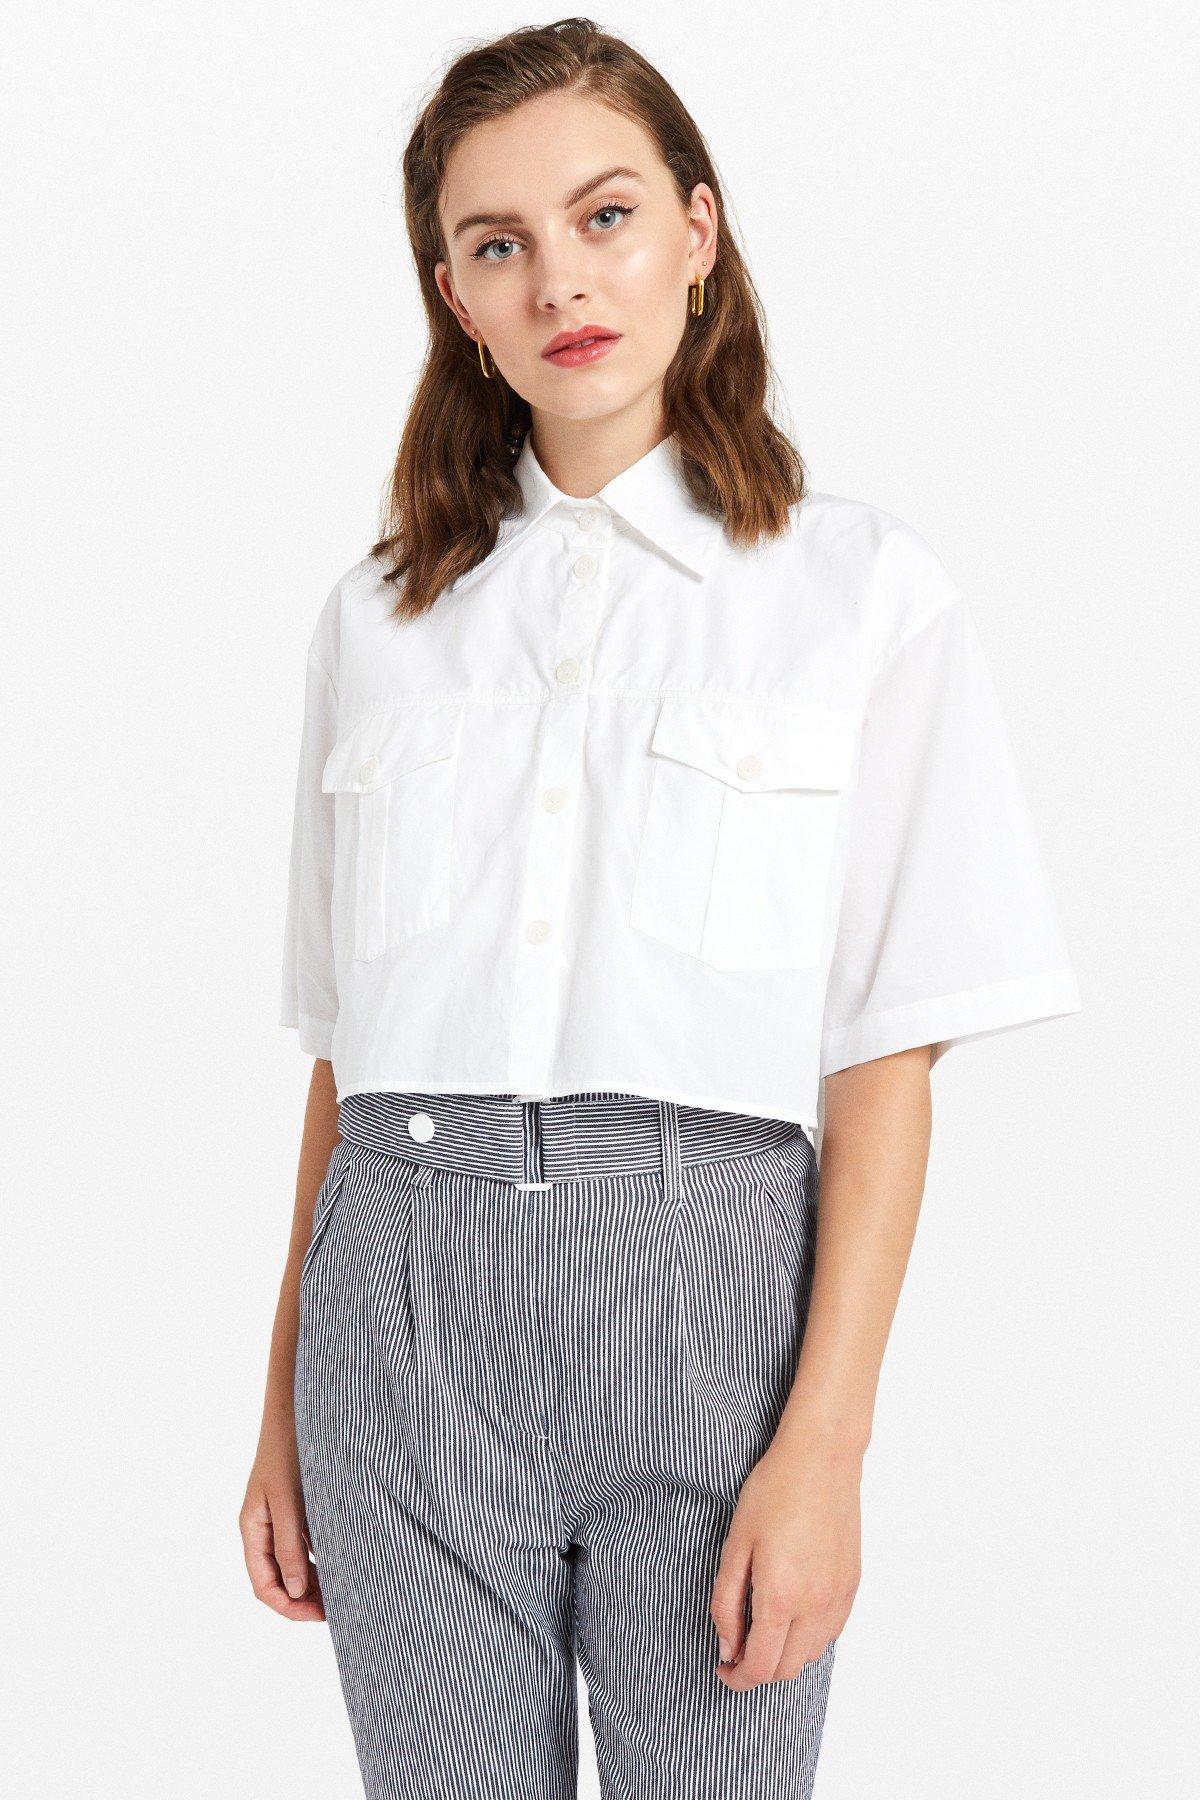 Poplin shirt with double garment's effect